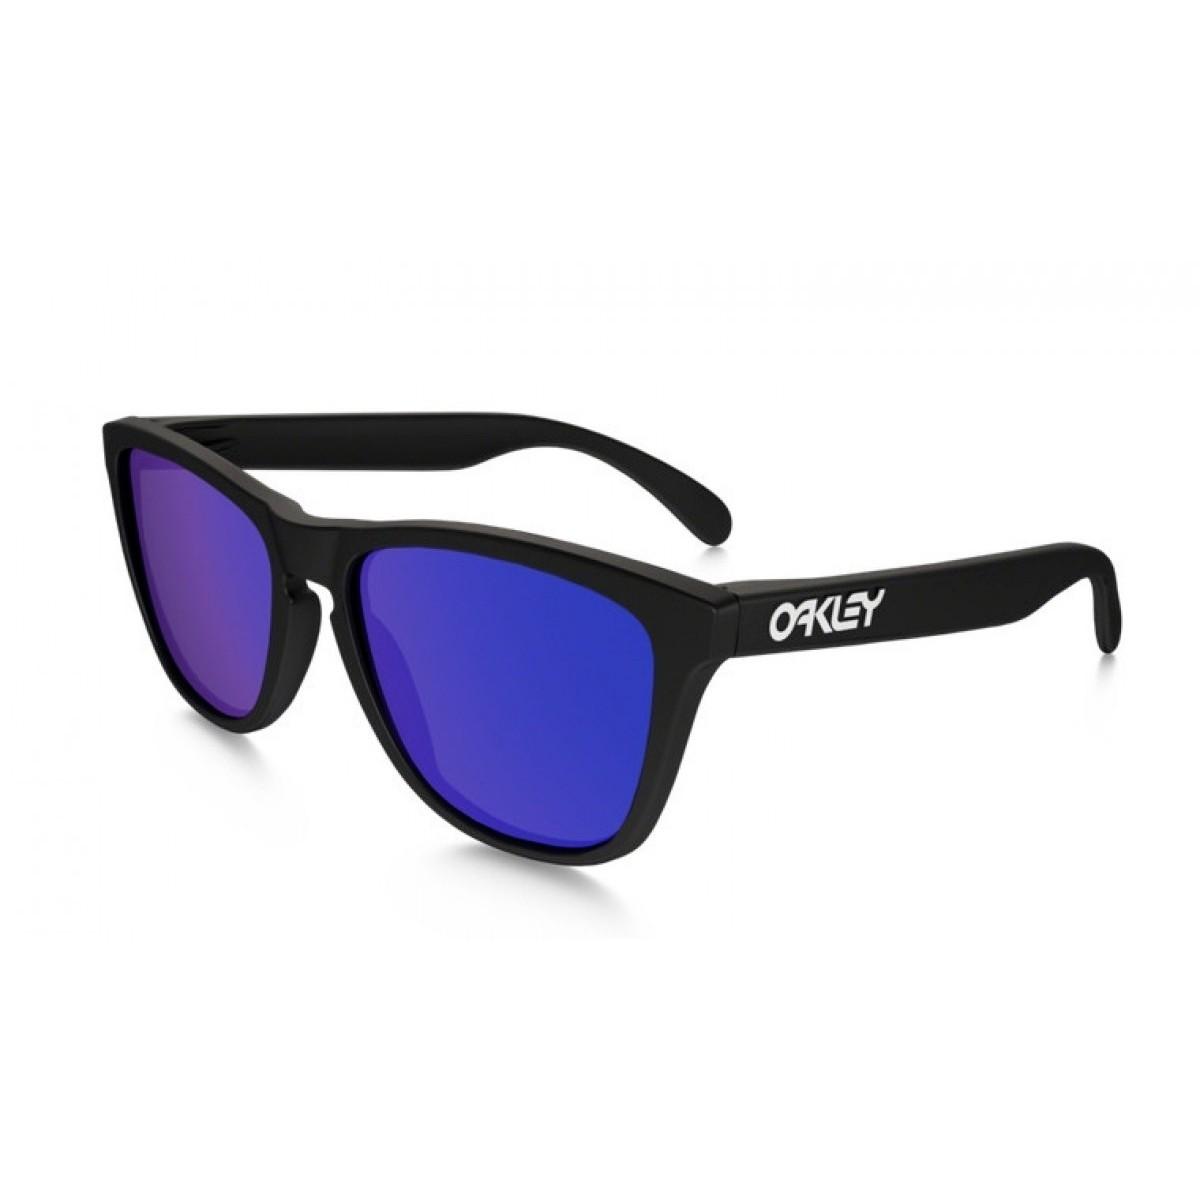 Oakley Frogskin 24-298, 69,99€, Occhiali Oakley Nero a forma Squadrato